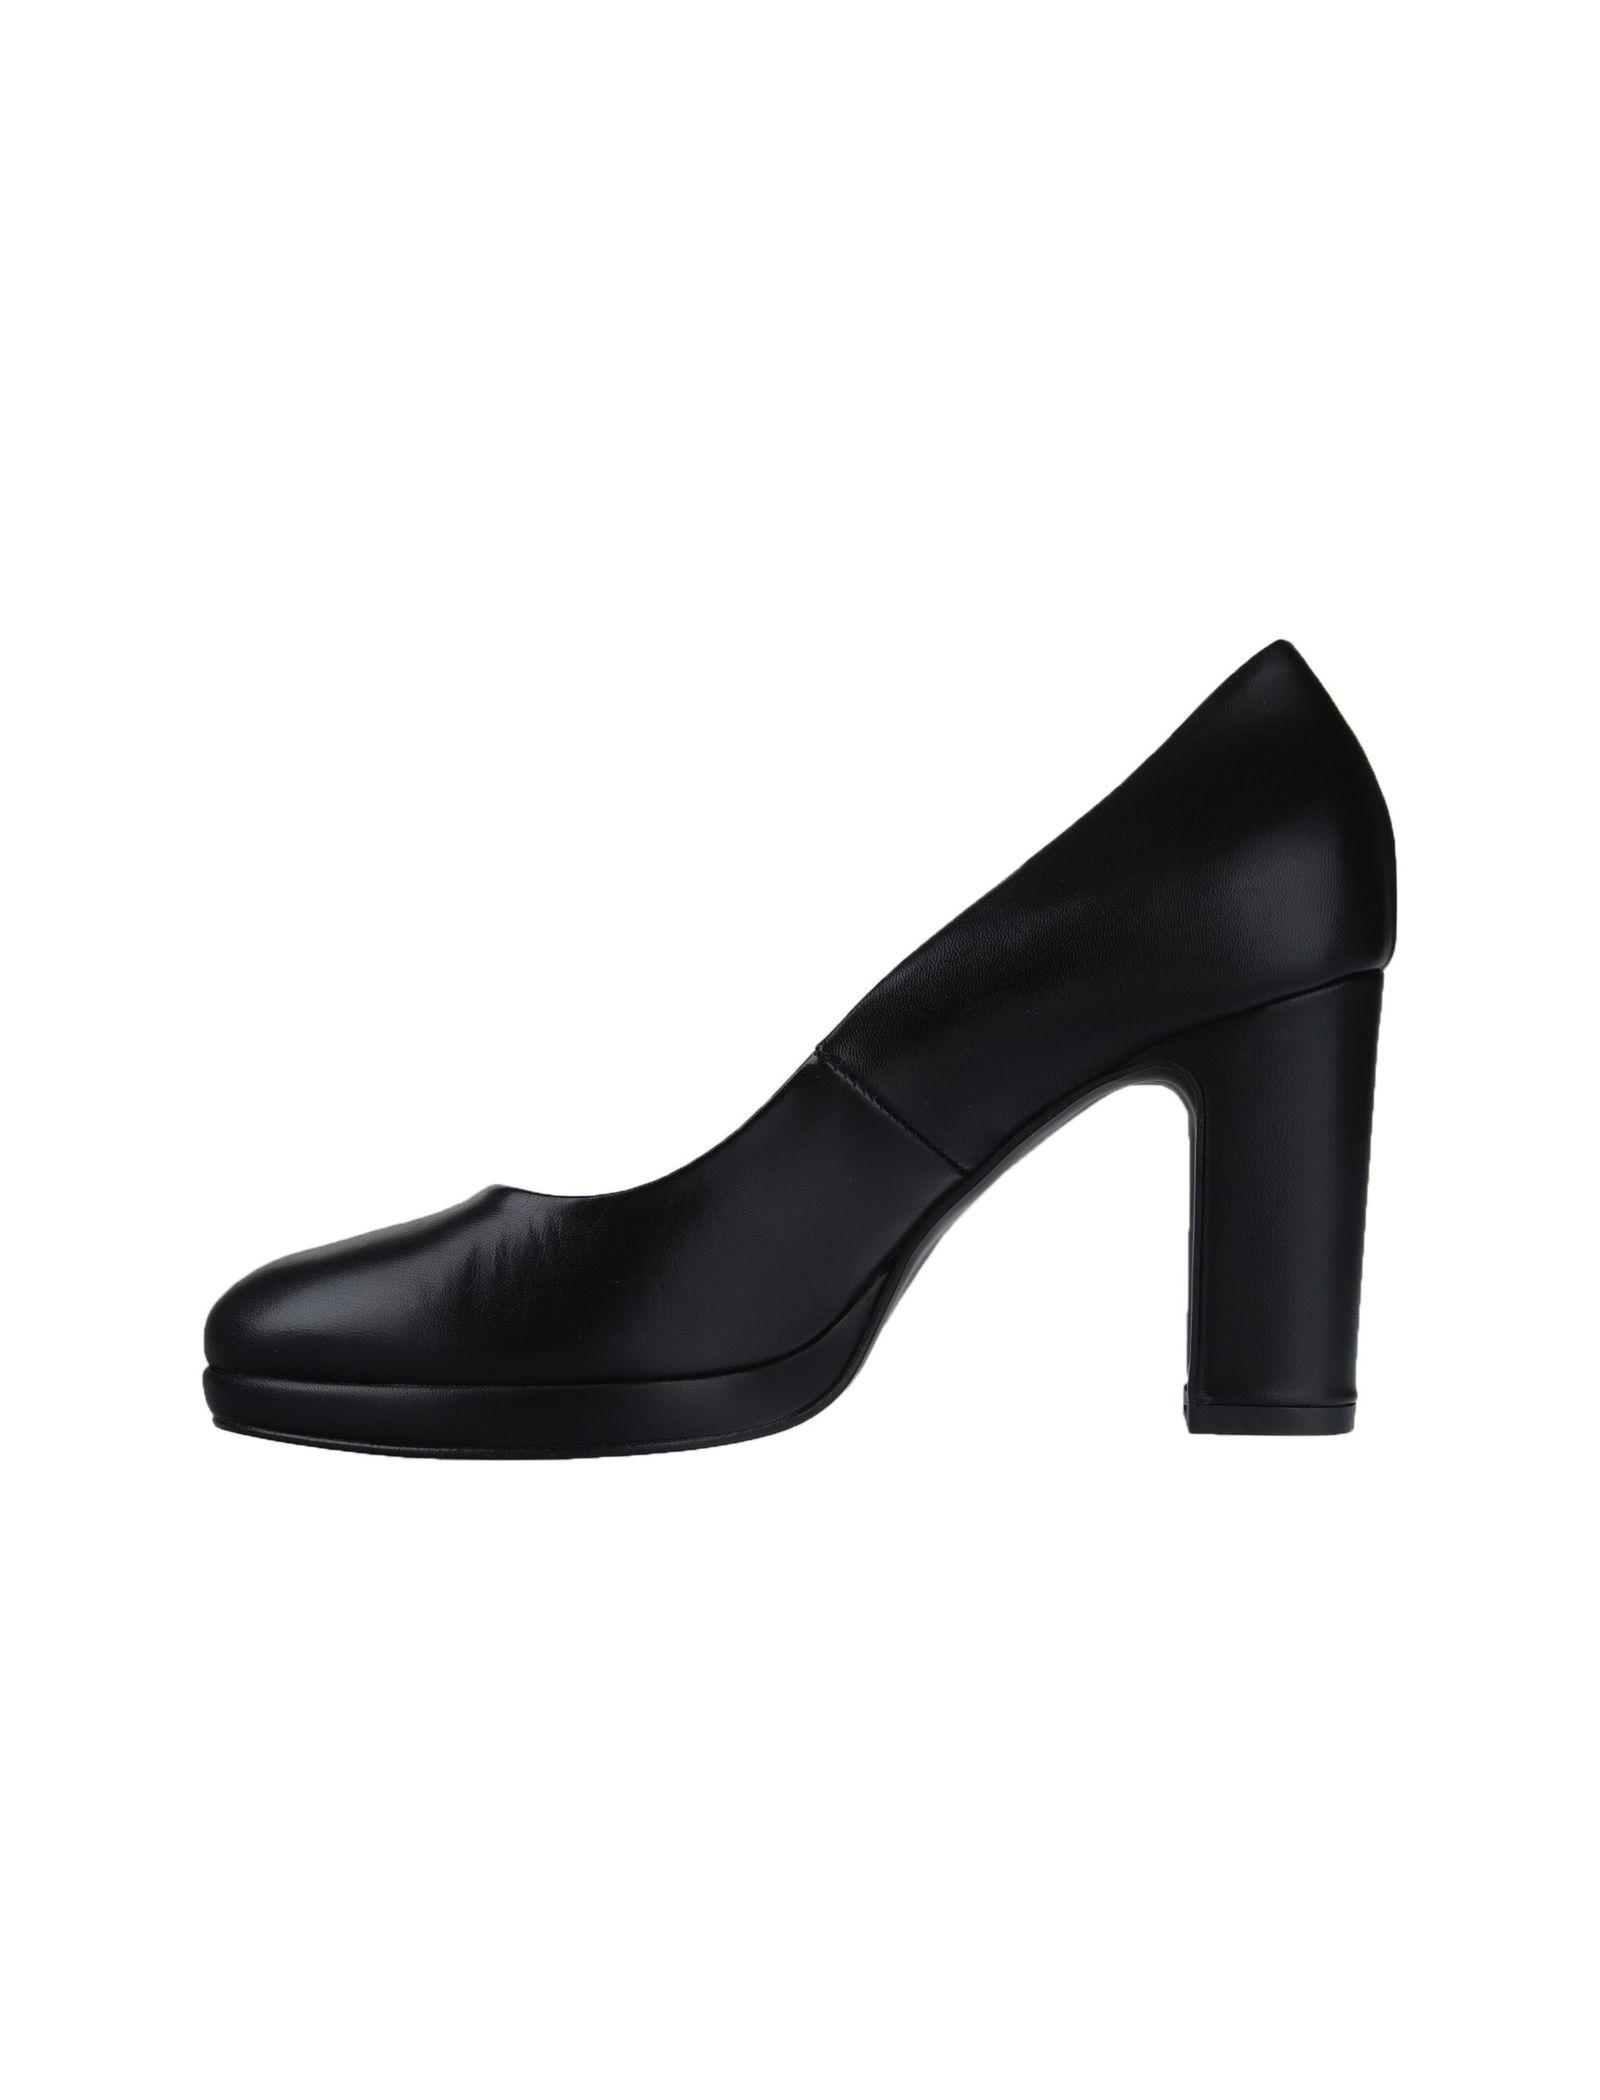 کفش چرم پاشنه بلند زنانه Julliet - دنیلی - مشکي - 2